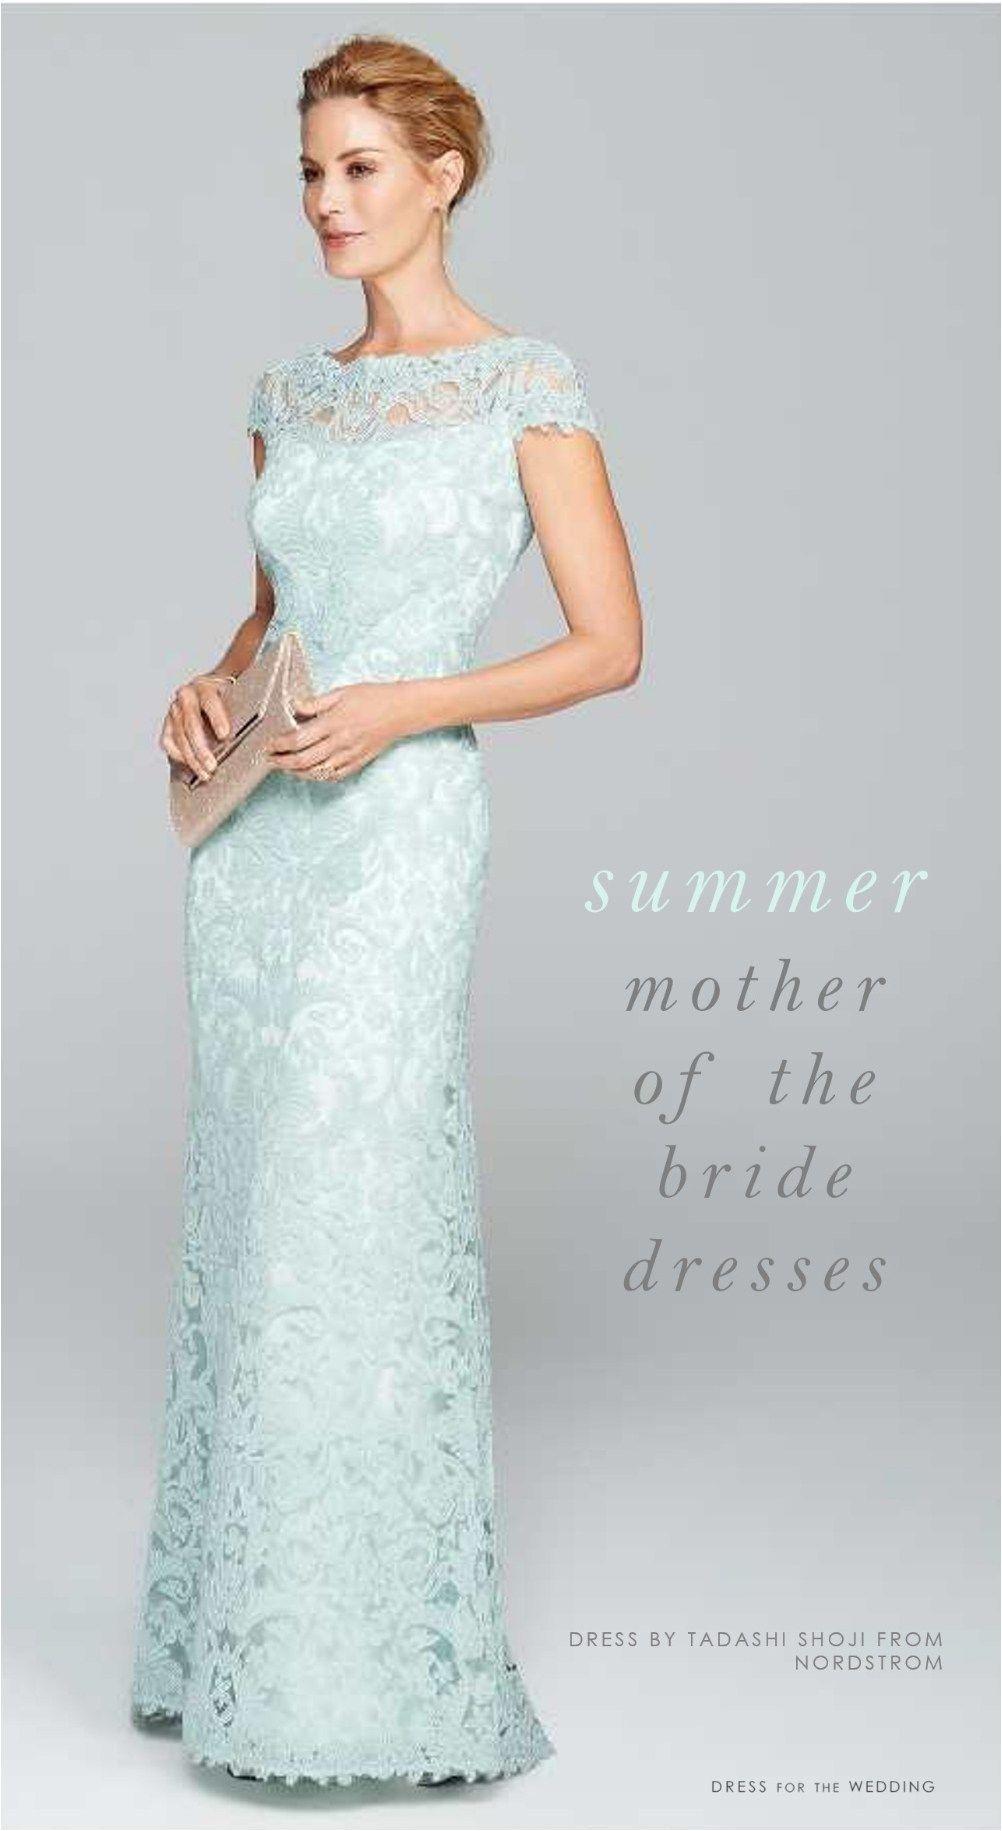 Summer wedding mother of the bride dresses  Mother Of The Groom   Mob dresses Bride dresses and Groom dress